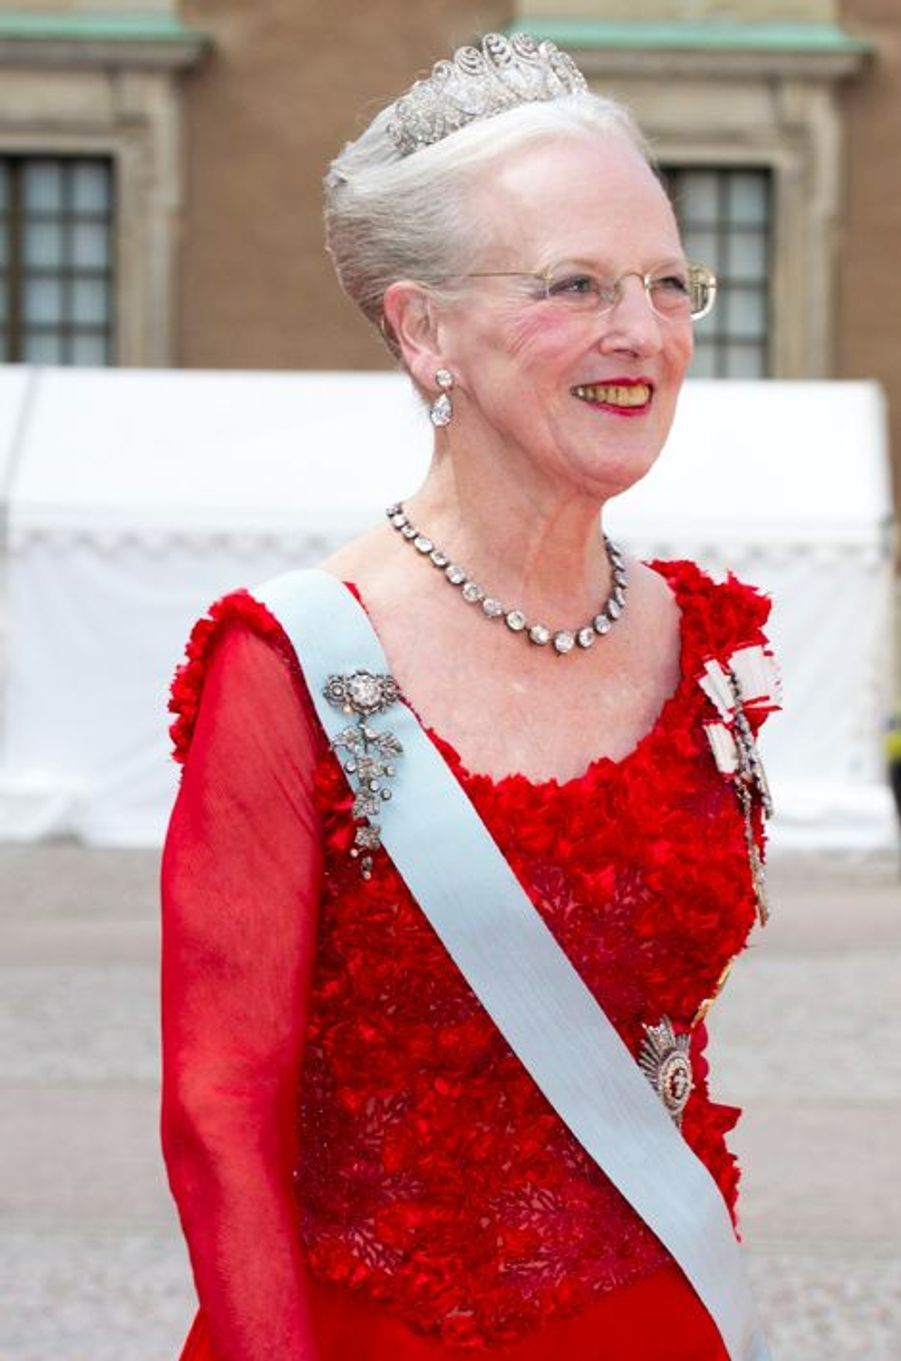 La reine Margrethe II de Danemark à Stockholm, le 13 juin 2015